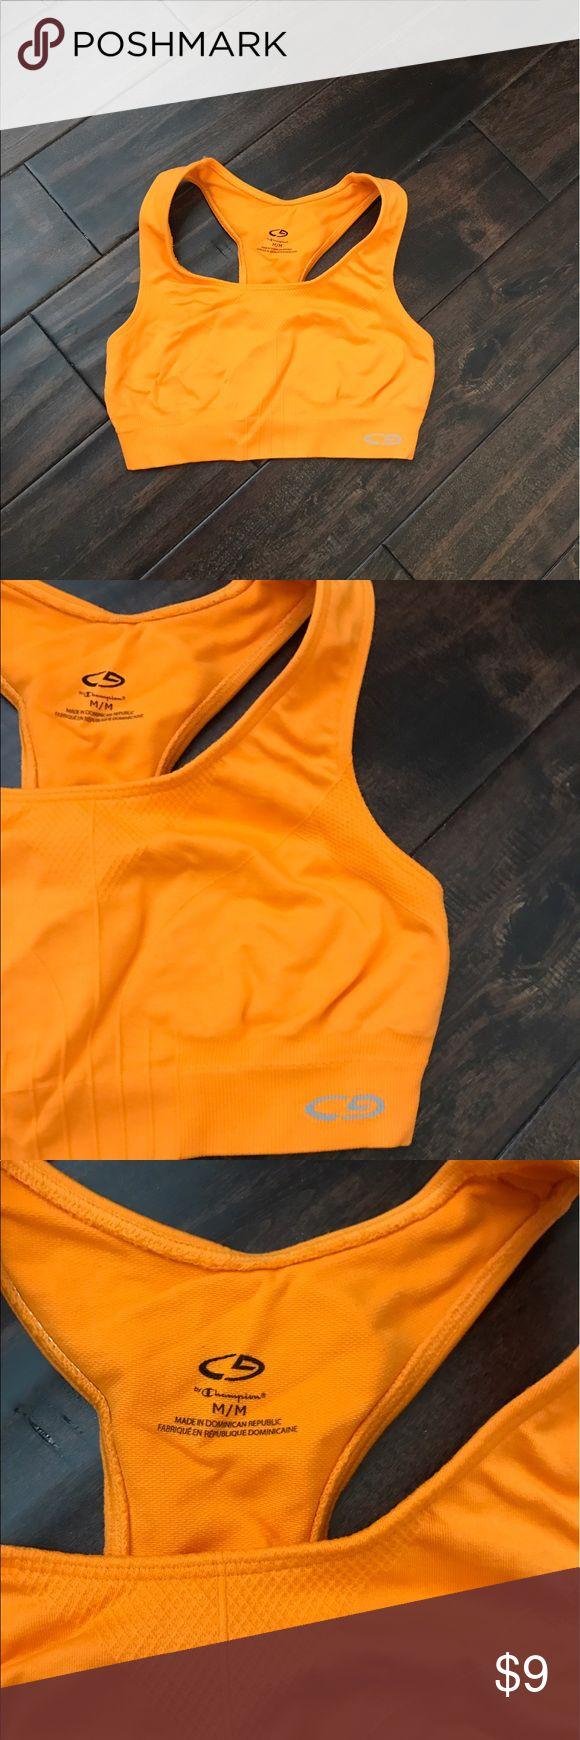 Champion sports bra size Medium orange Champion sports bra size Medium orange. Worn and washed only one. Perfect condition. So cute and good support. Champion Intimates & Sleepwear Bras